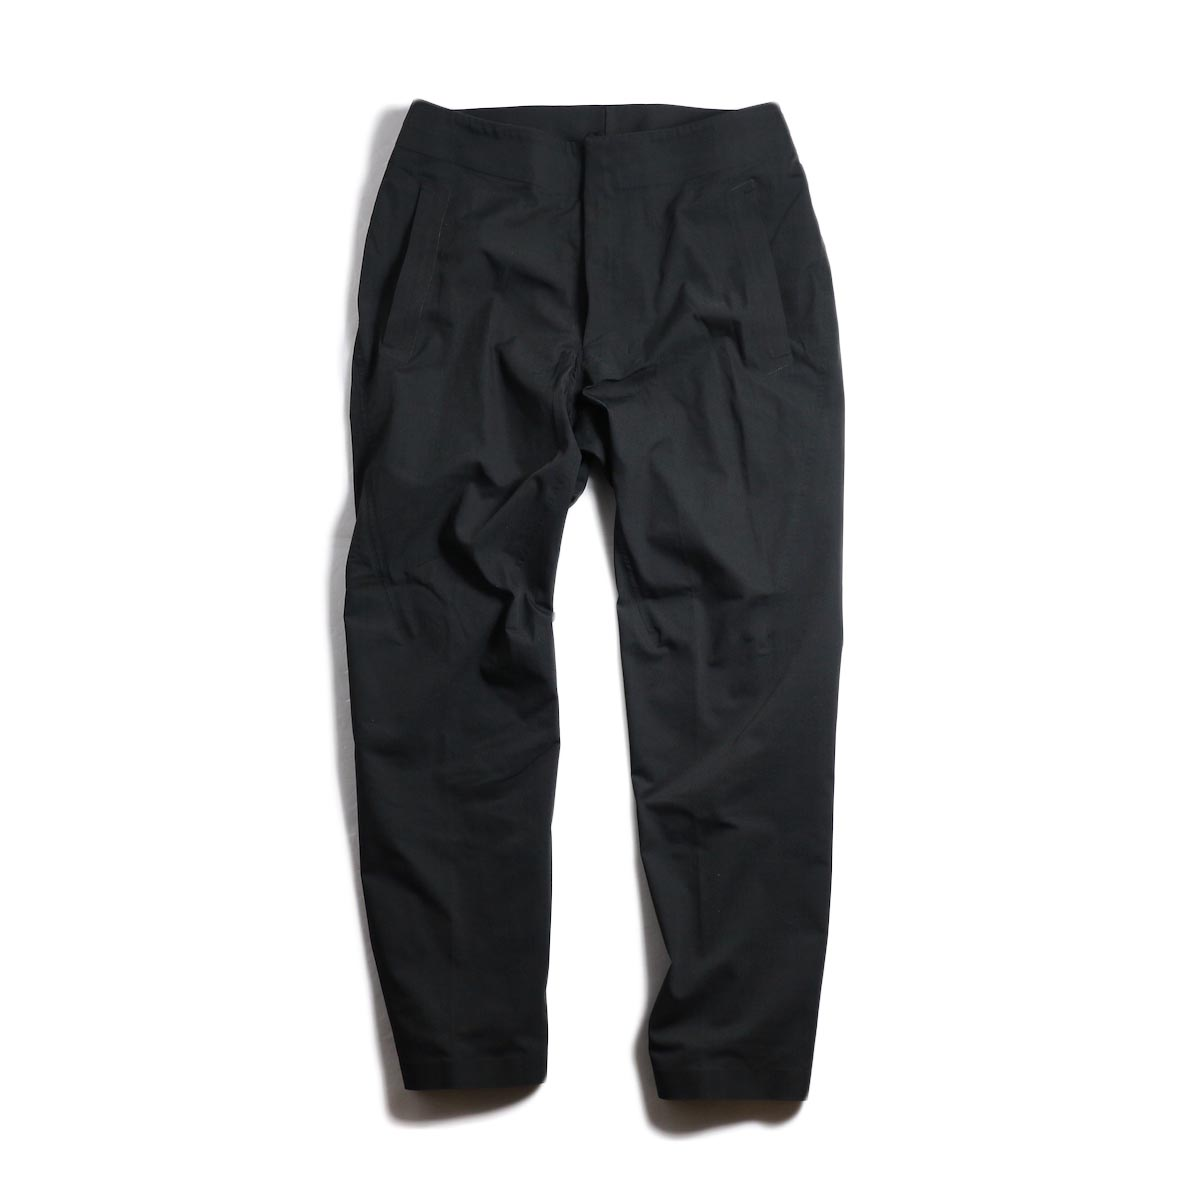 DESCENTE ALLTERAIN / Boa Long Pants Tapered Fit -Black